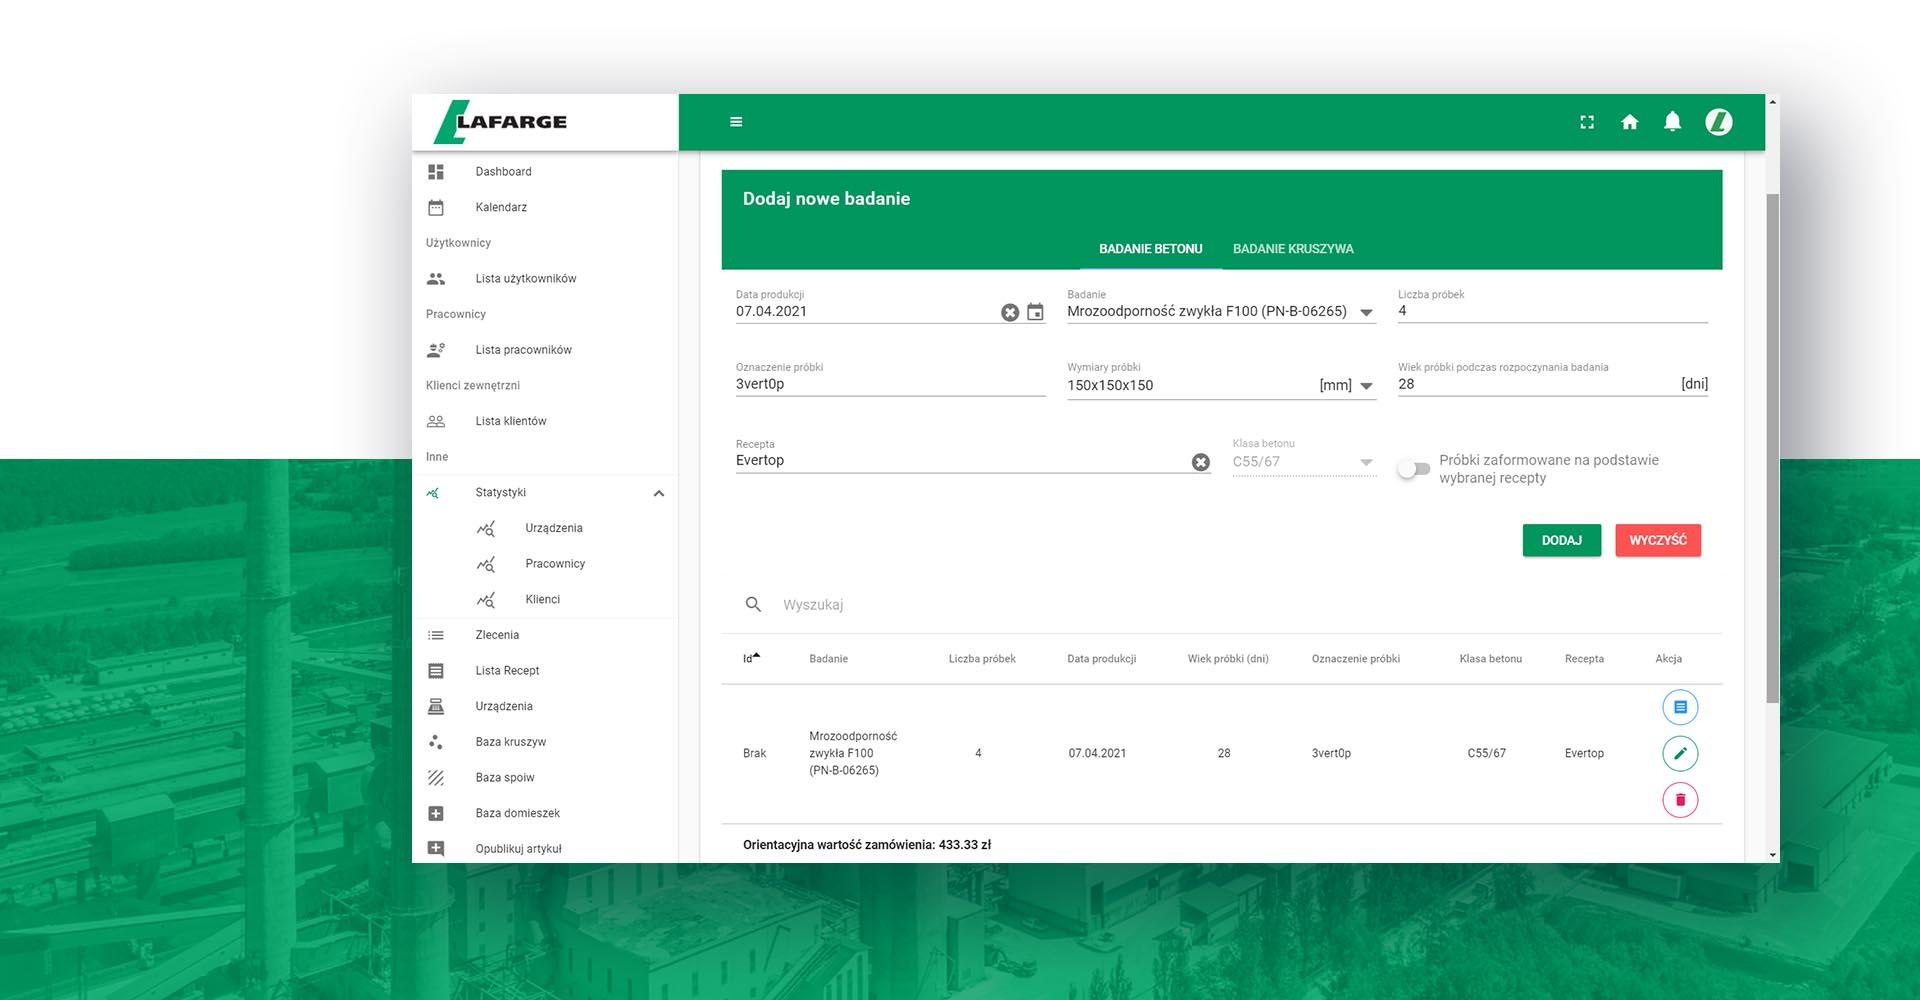 LIMS - Laboratory Information Management System.